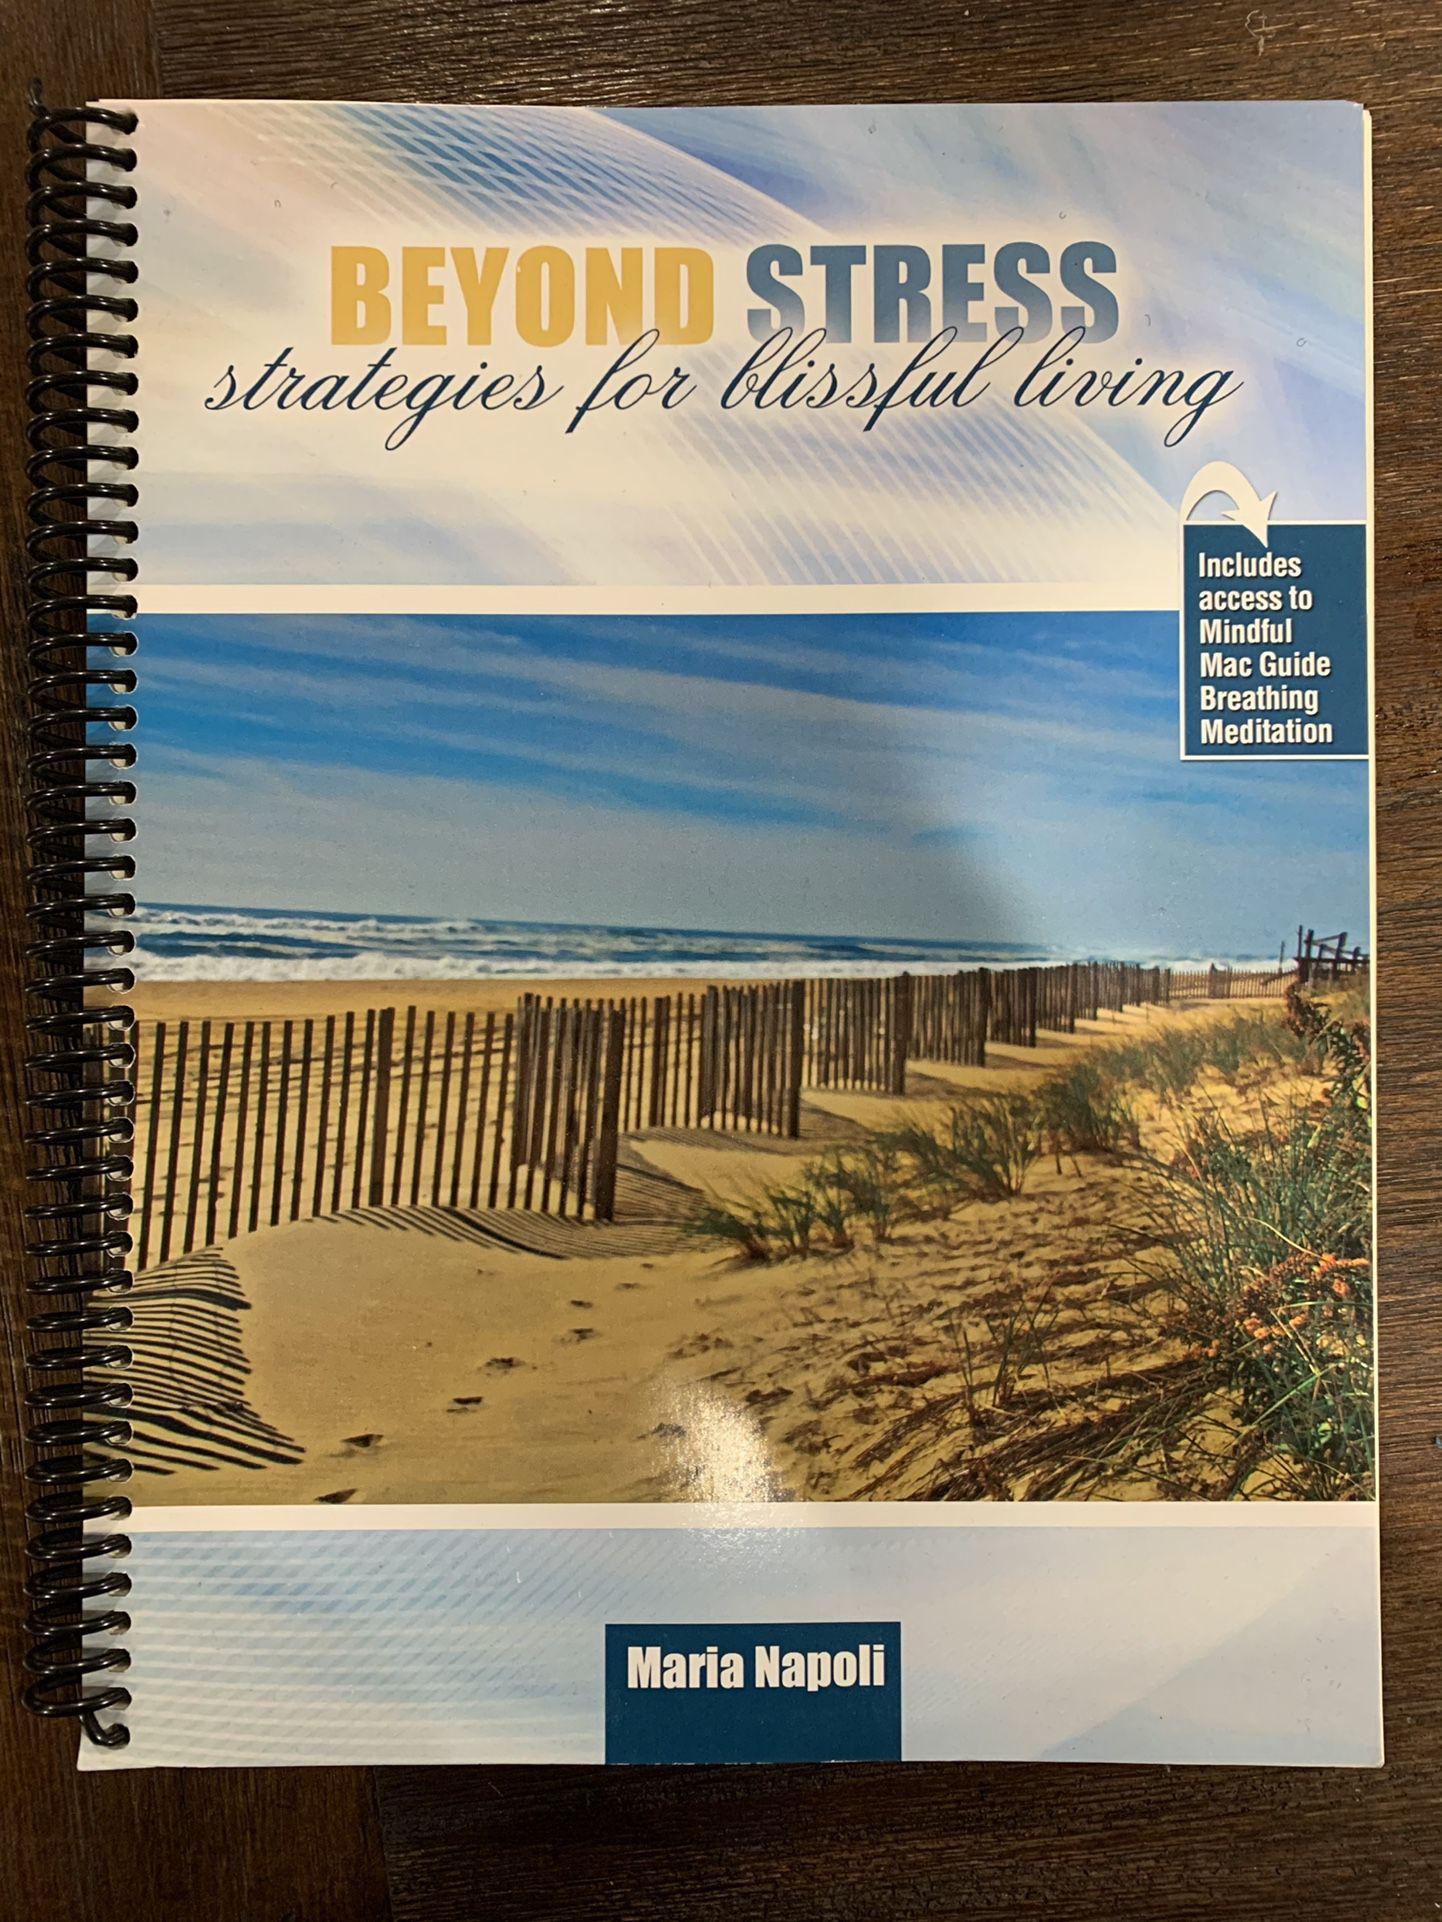 Beyond Stress: Strategies for Blissful Living